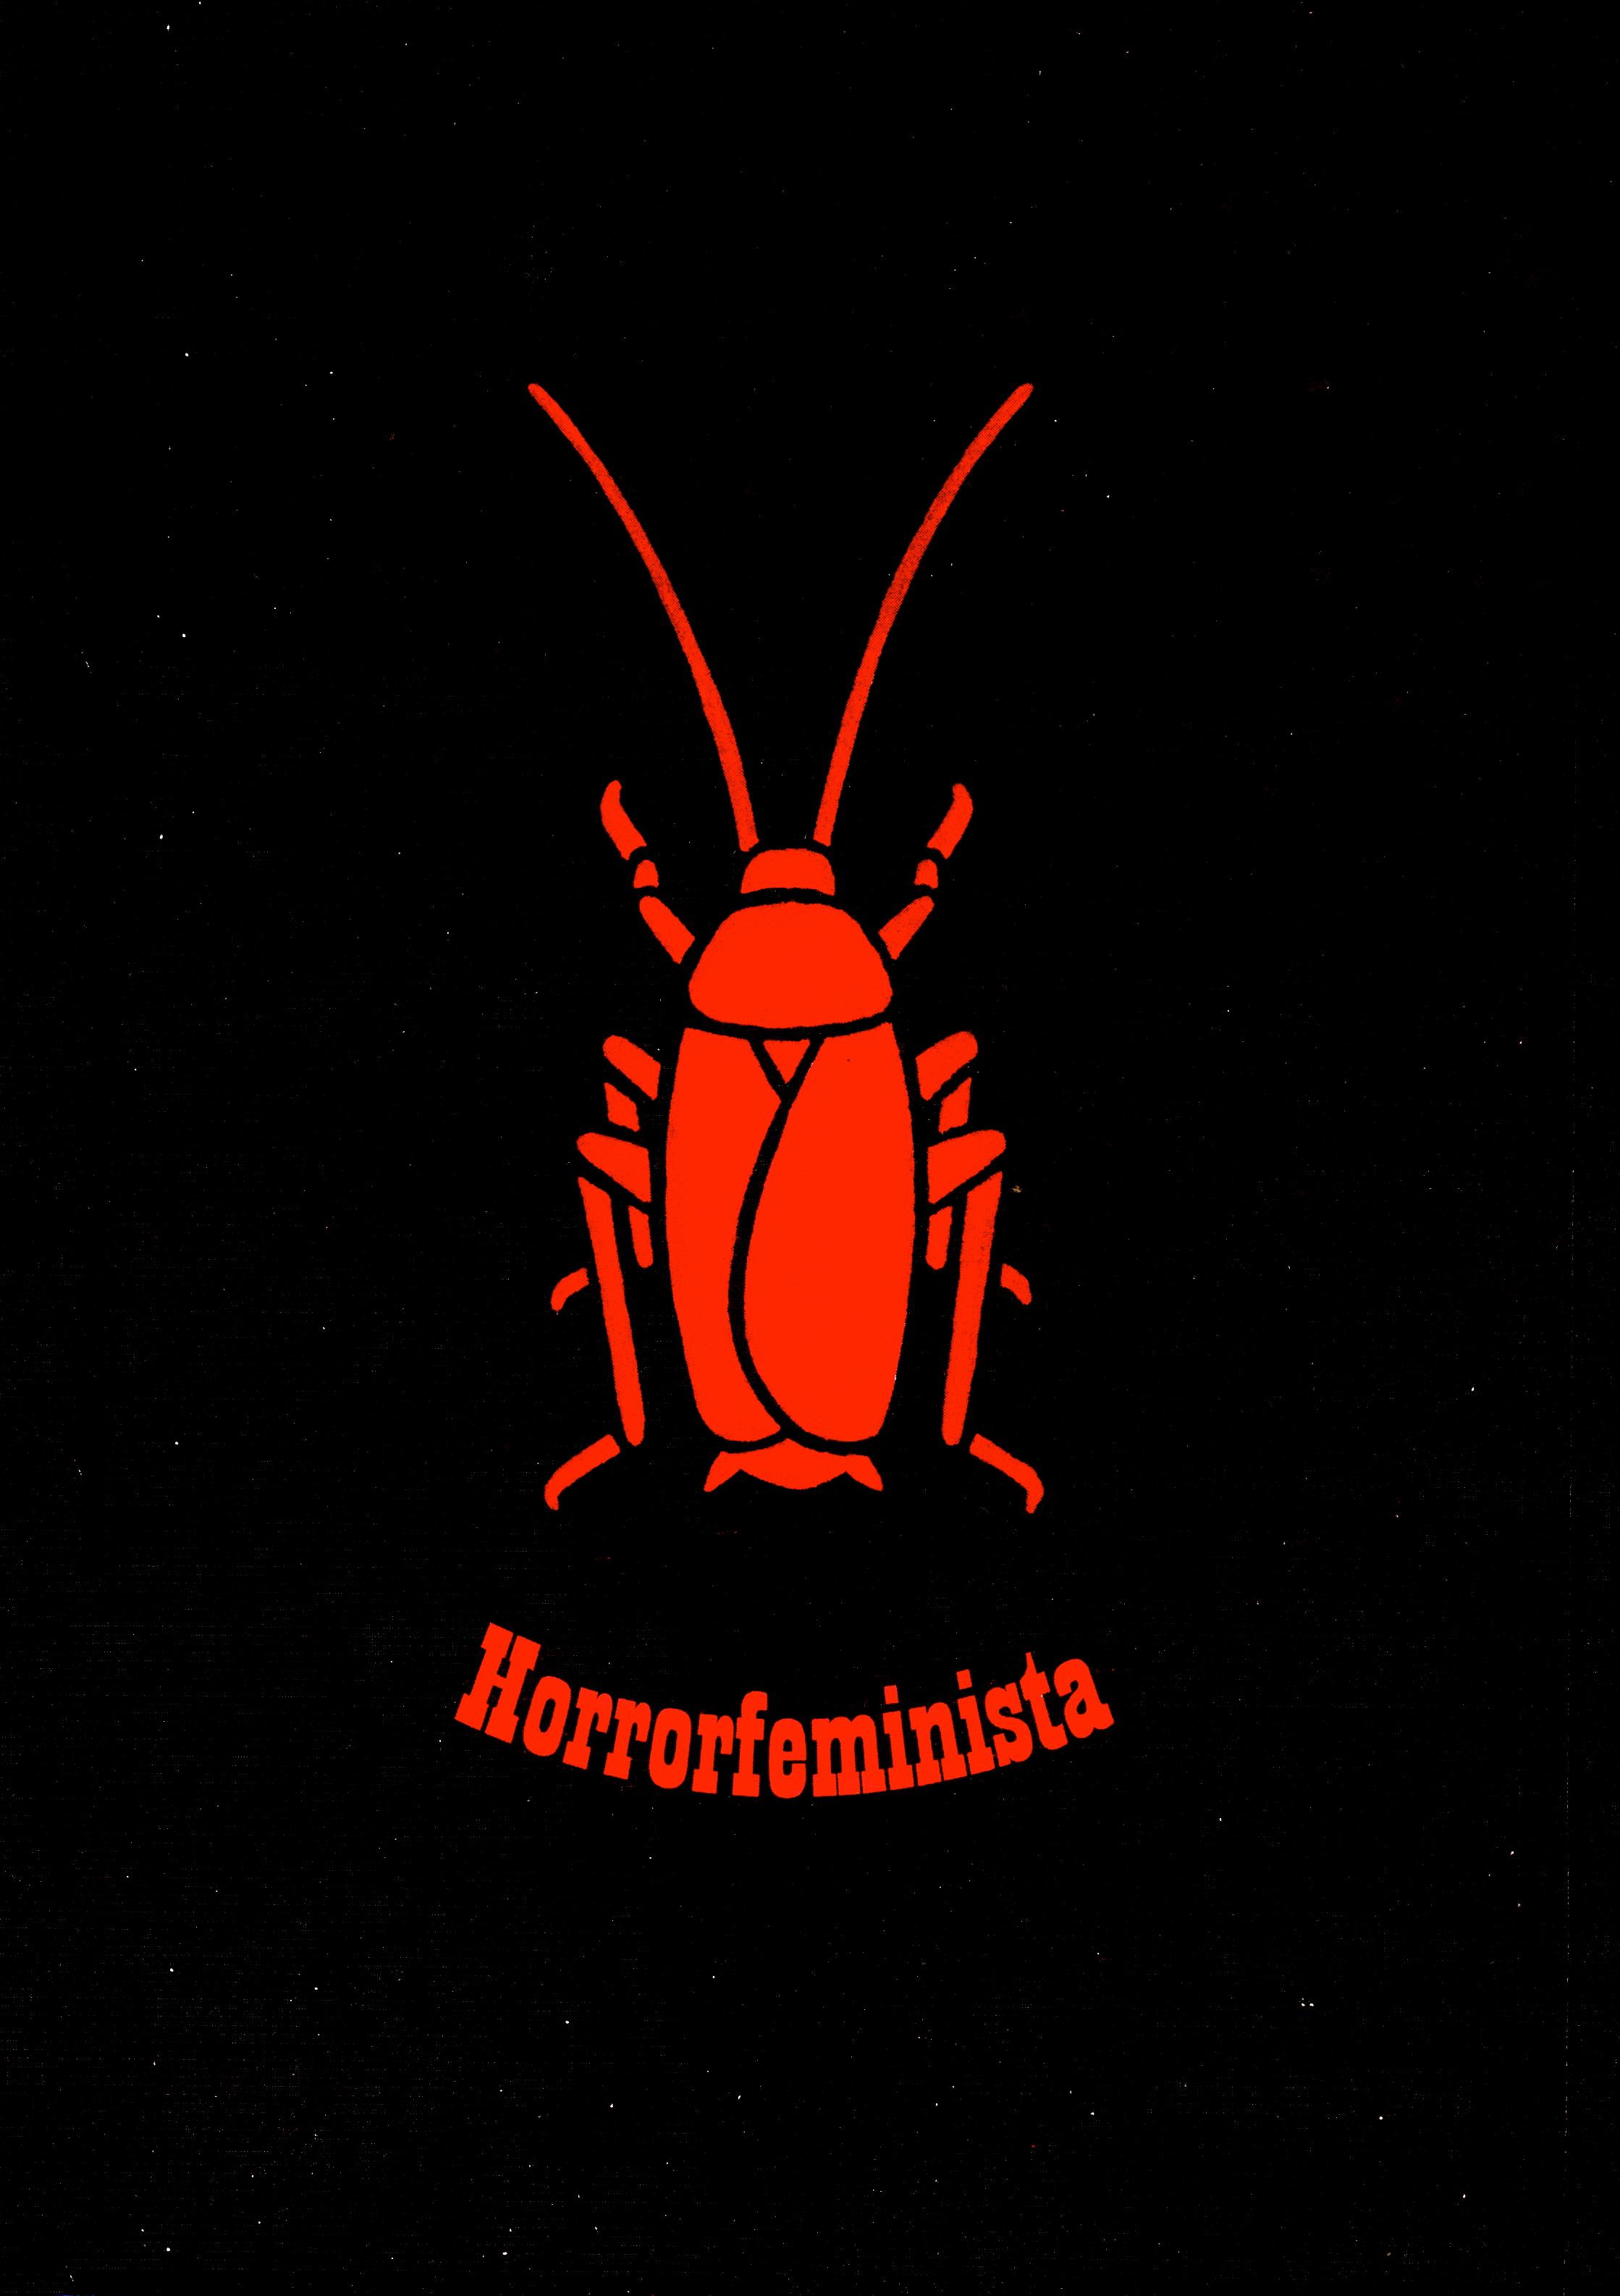 horrorfeminista logo 2